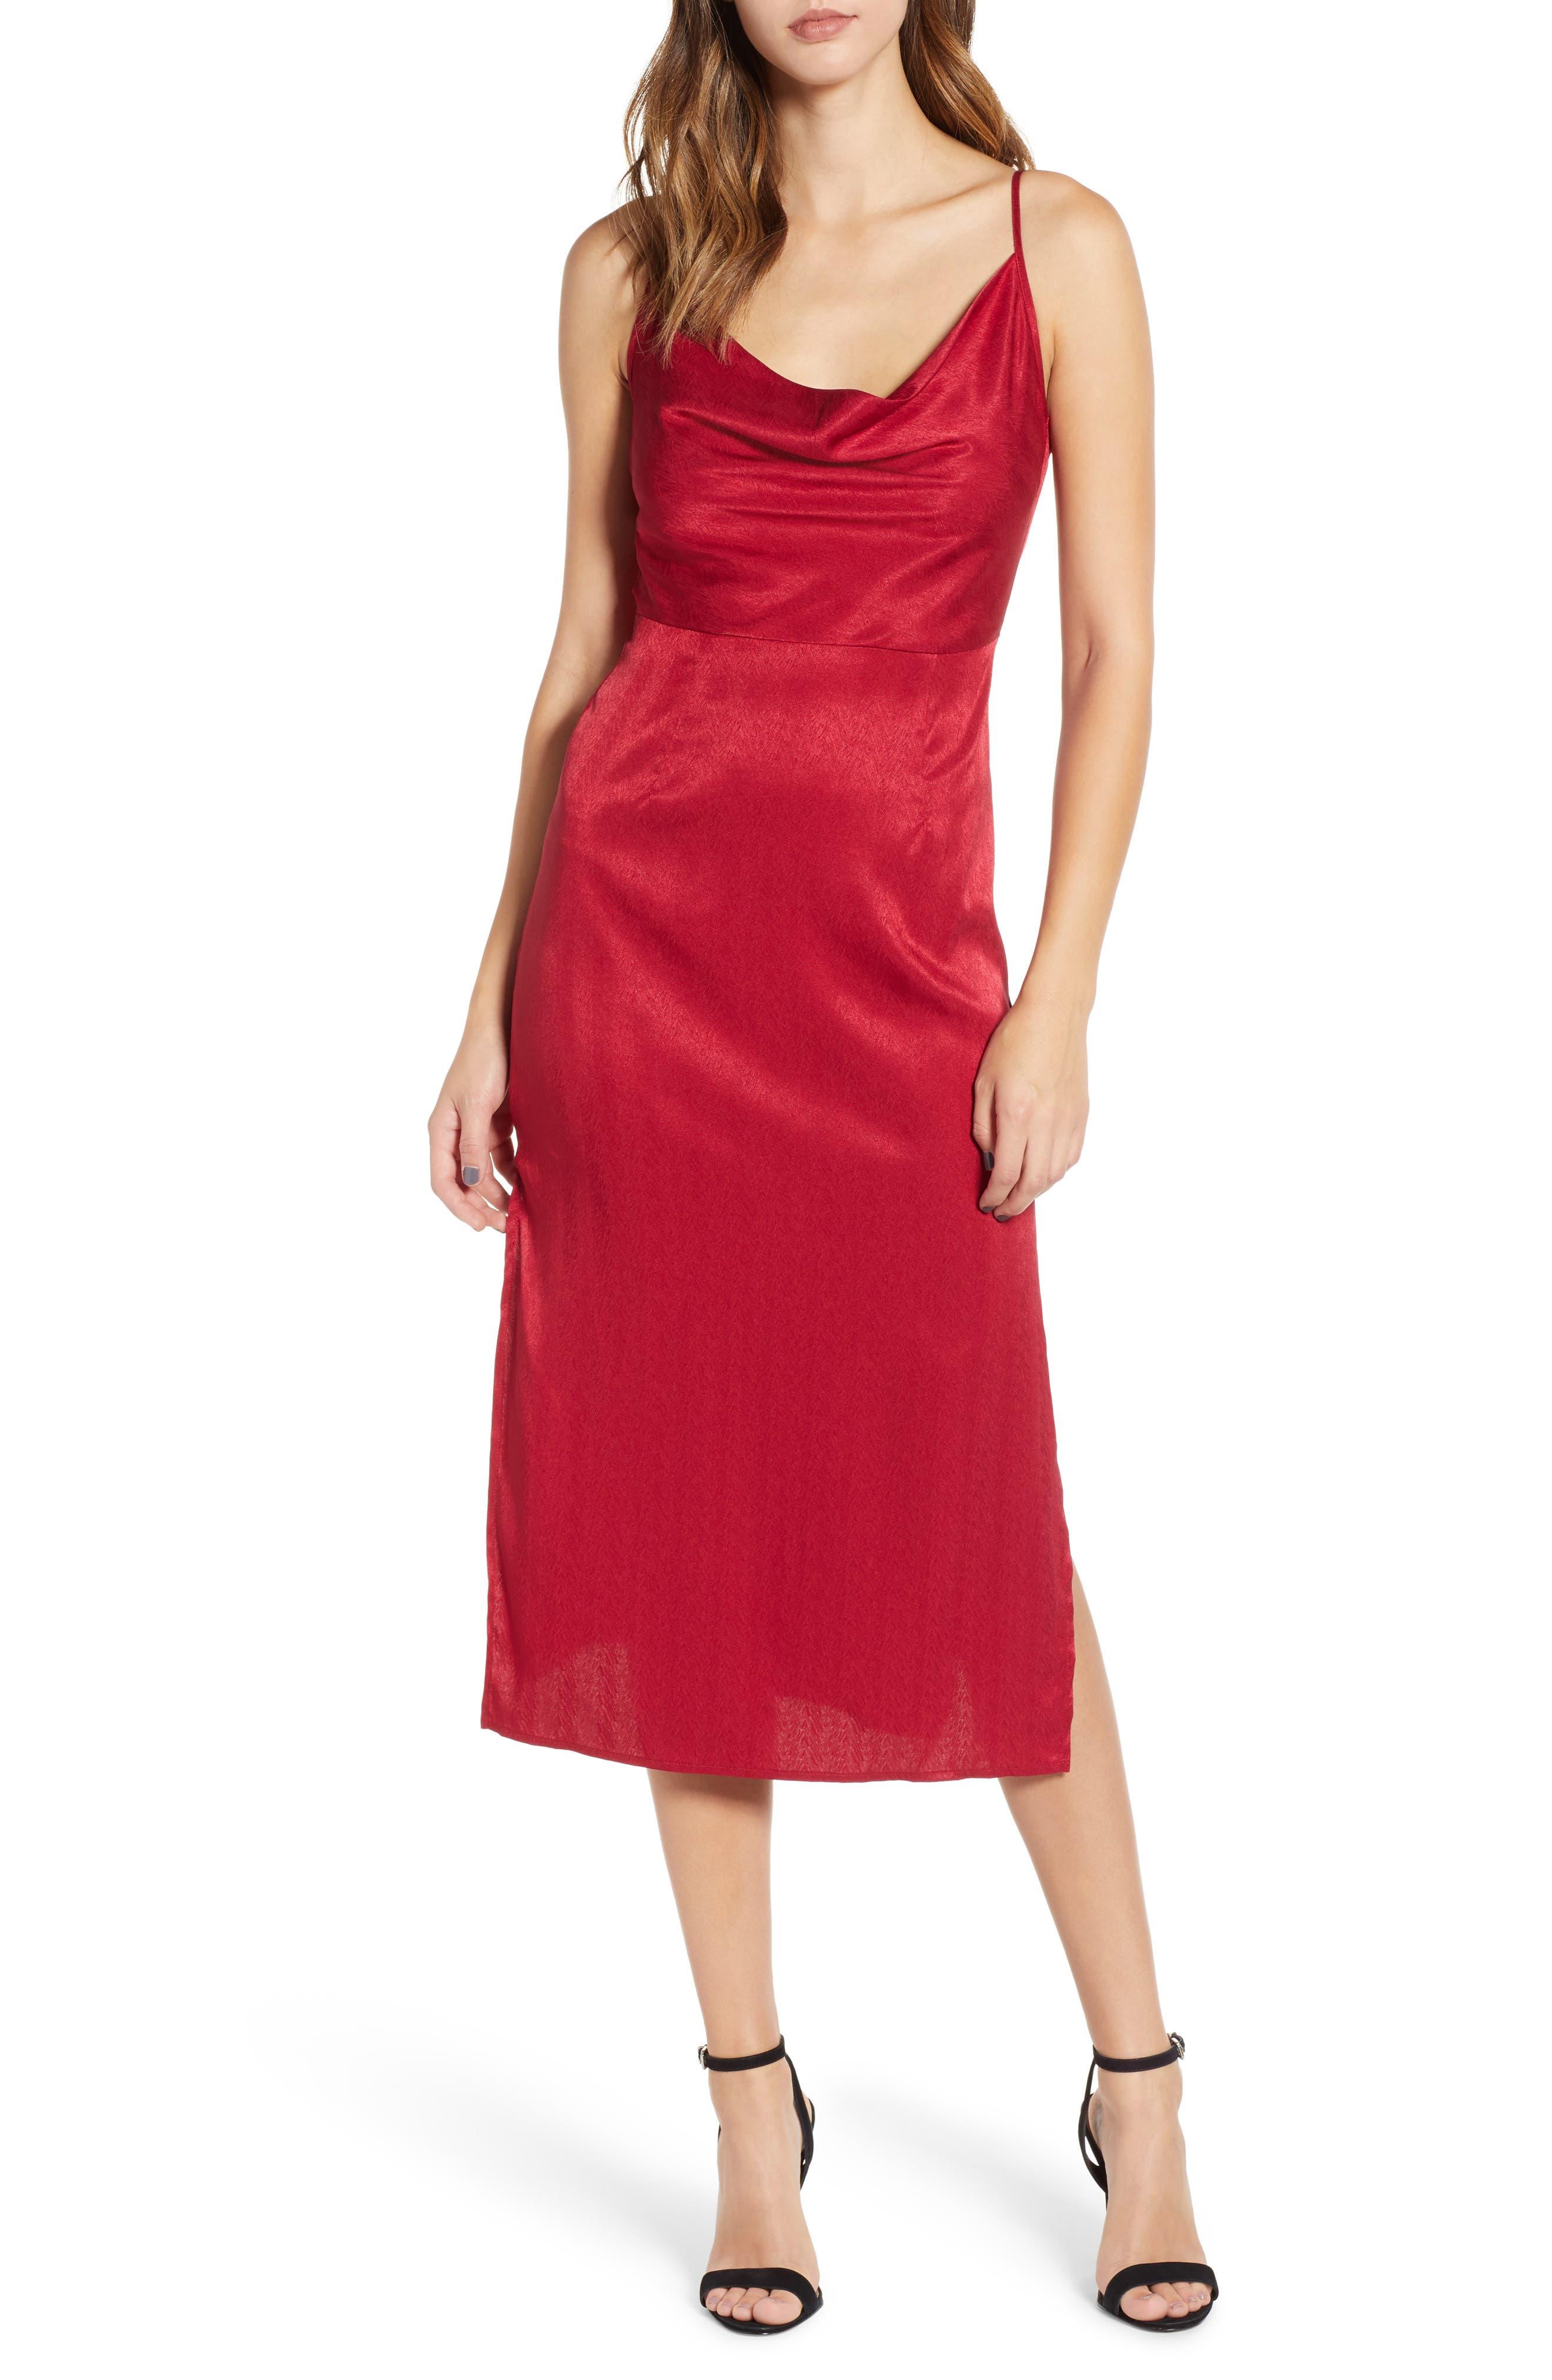 Womens The Fifth Label Dresses Nordstrom Rvca Circuit Tshirt Shortsleeve Boys39